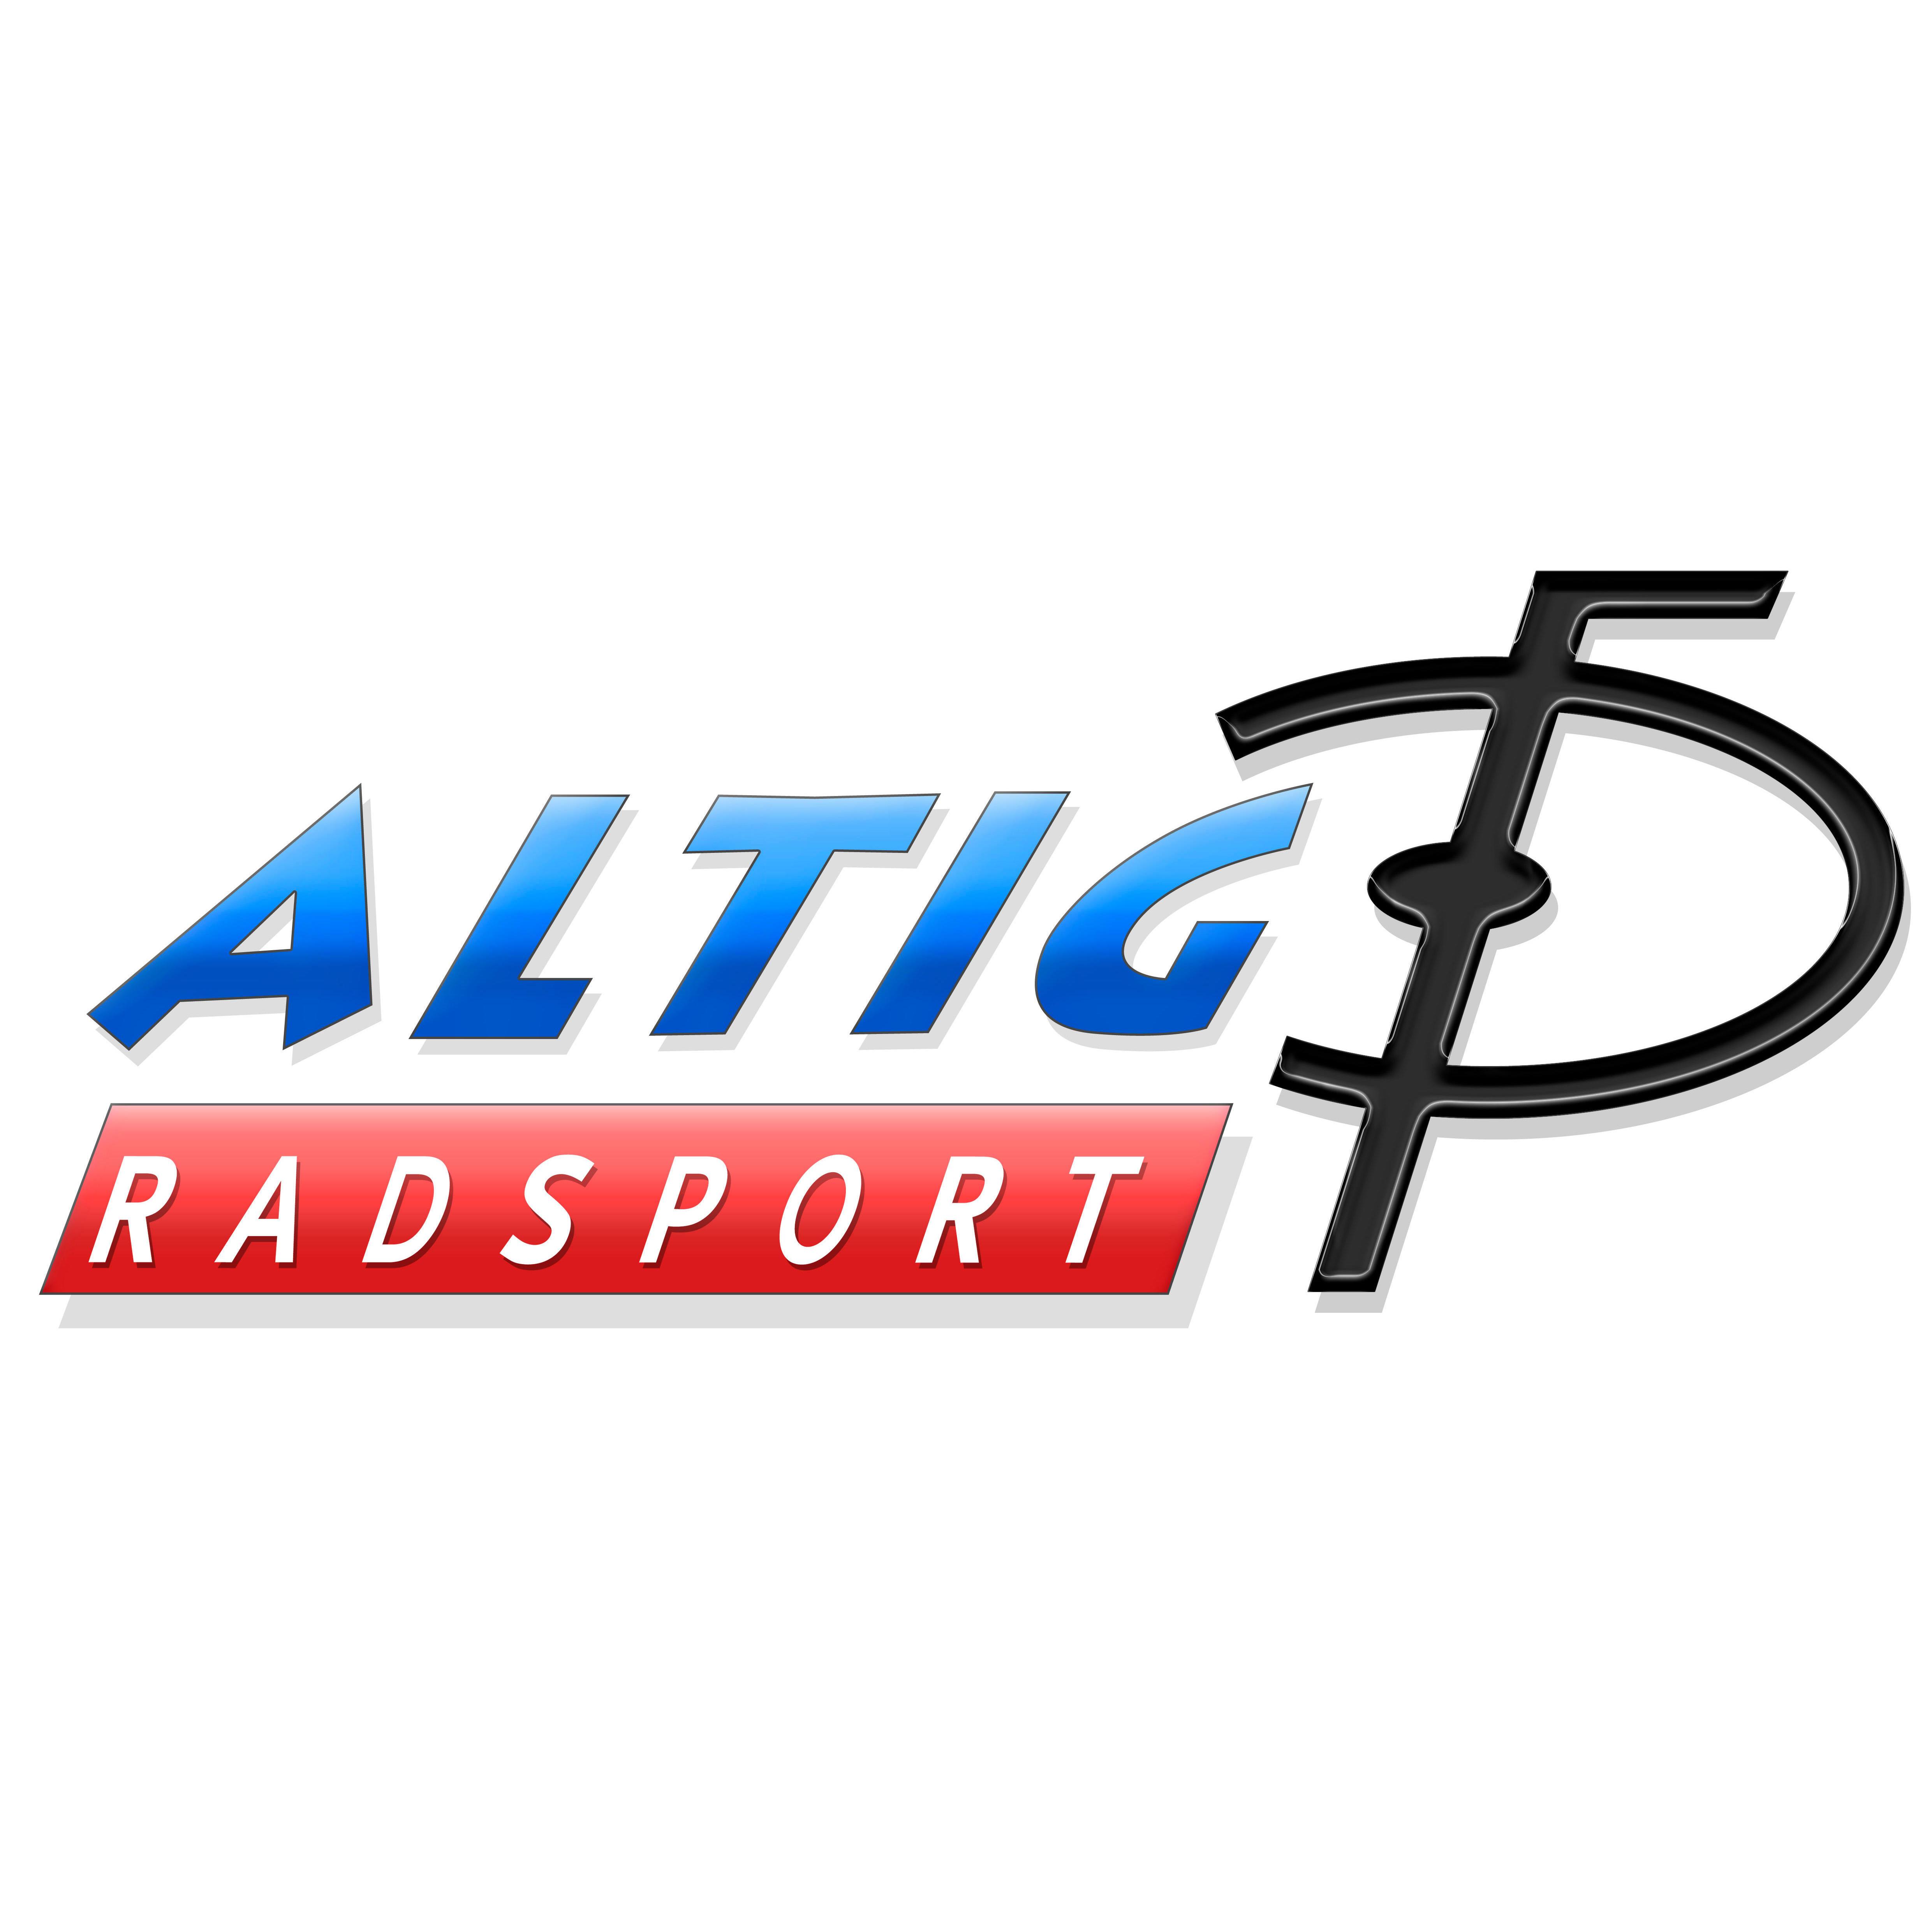 Radsport Altig, Inh. Willi Altig